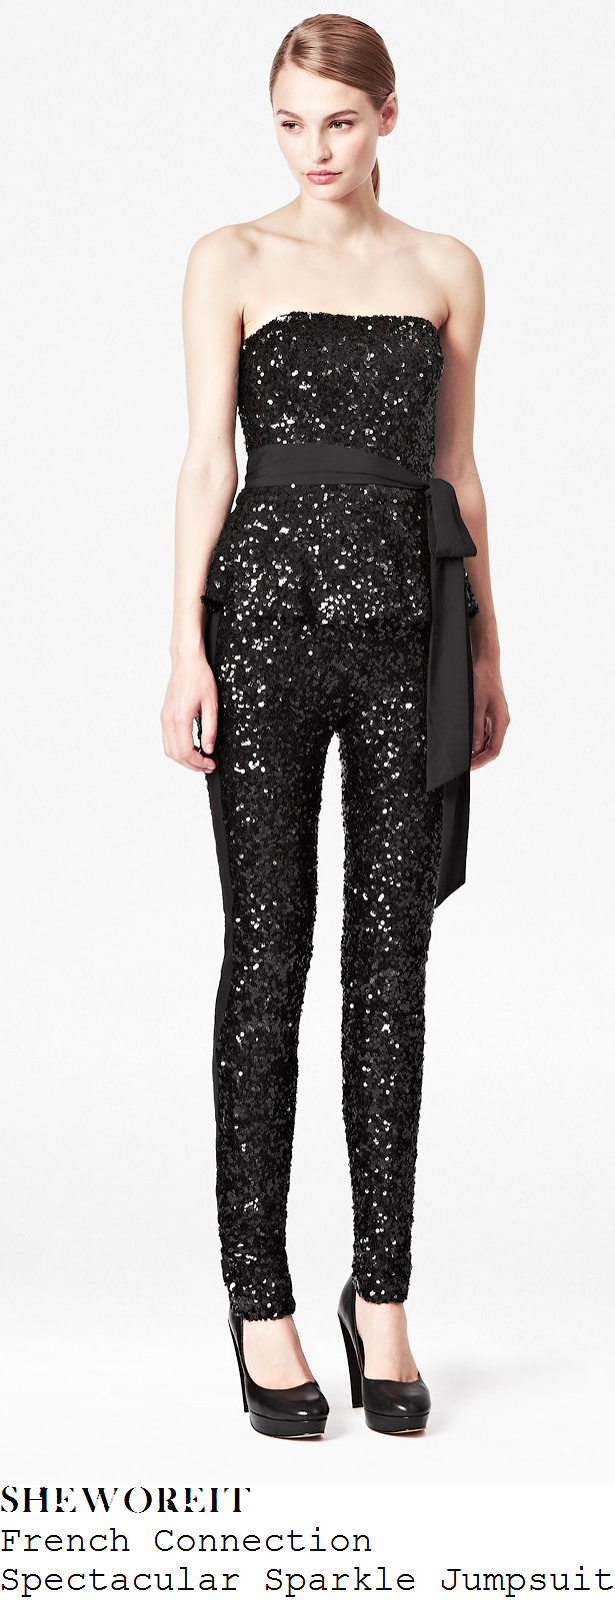 tamera-foster-black-strapless-sequin-peplum-jumpsuit-x-factor-big-band-week